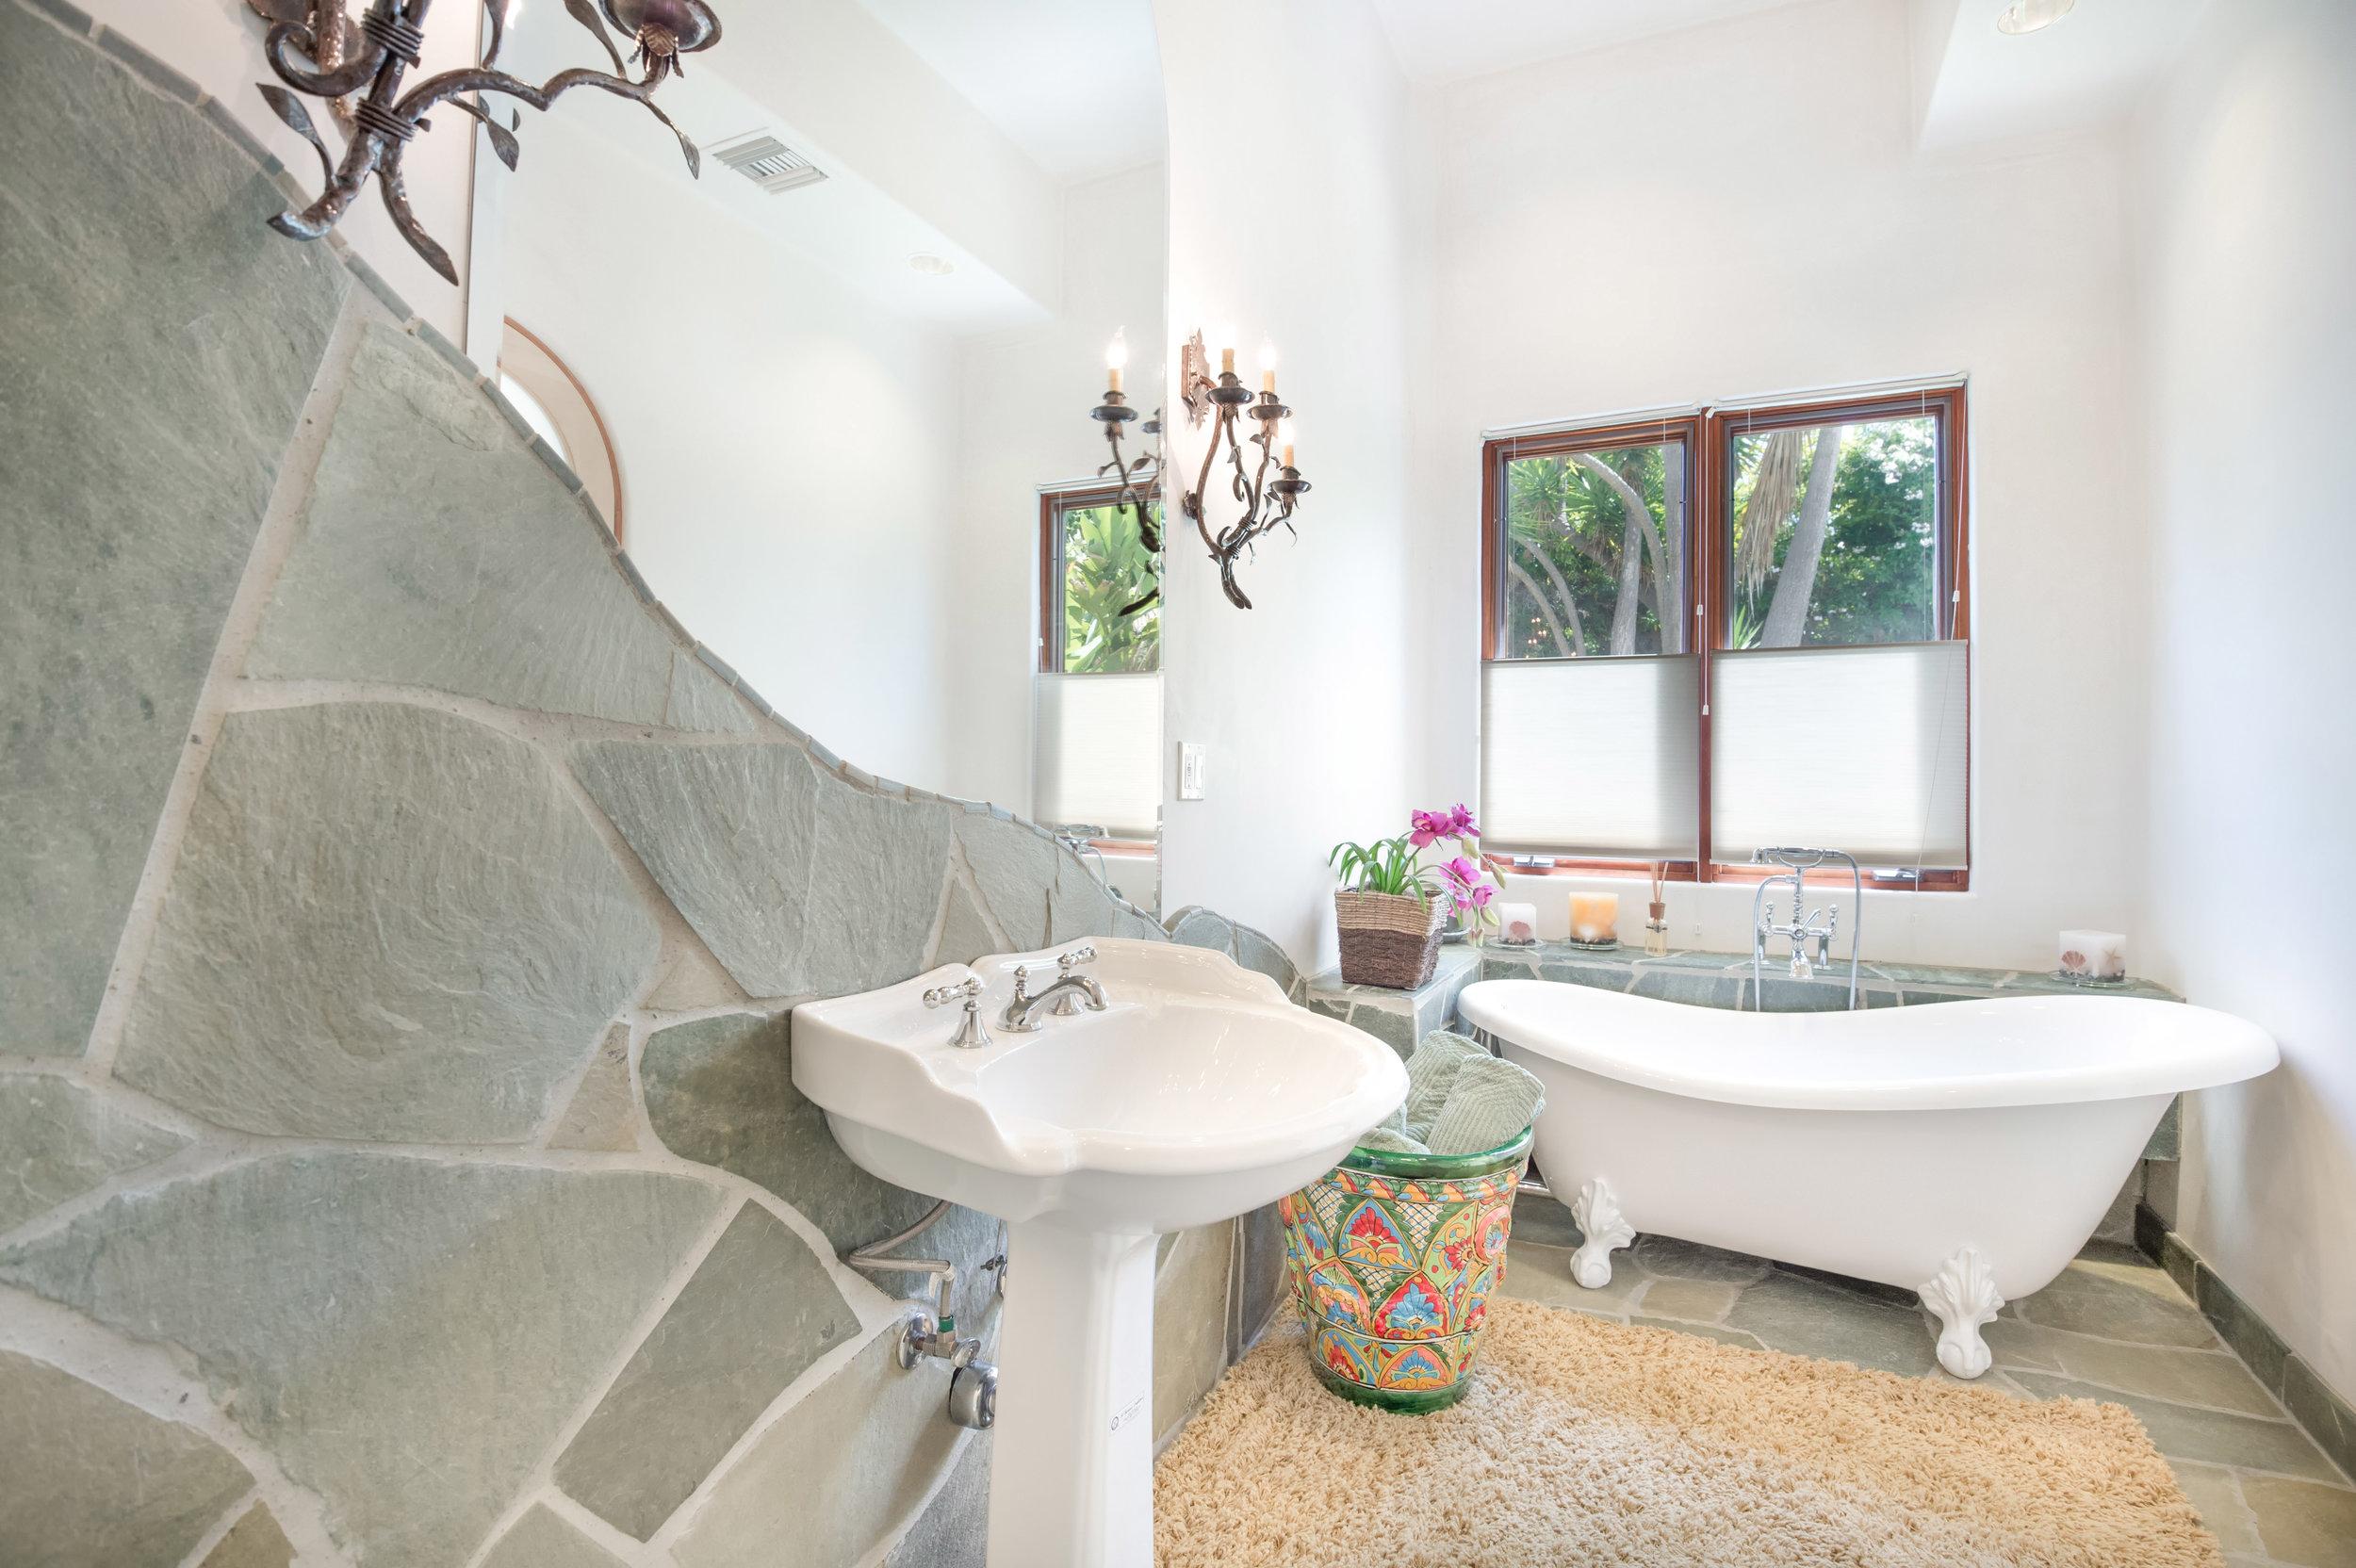 022 guest bathroom 6405 bonsall Malibu For Sale The Malibu Life Team Luxury Real Estate.jpg